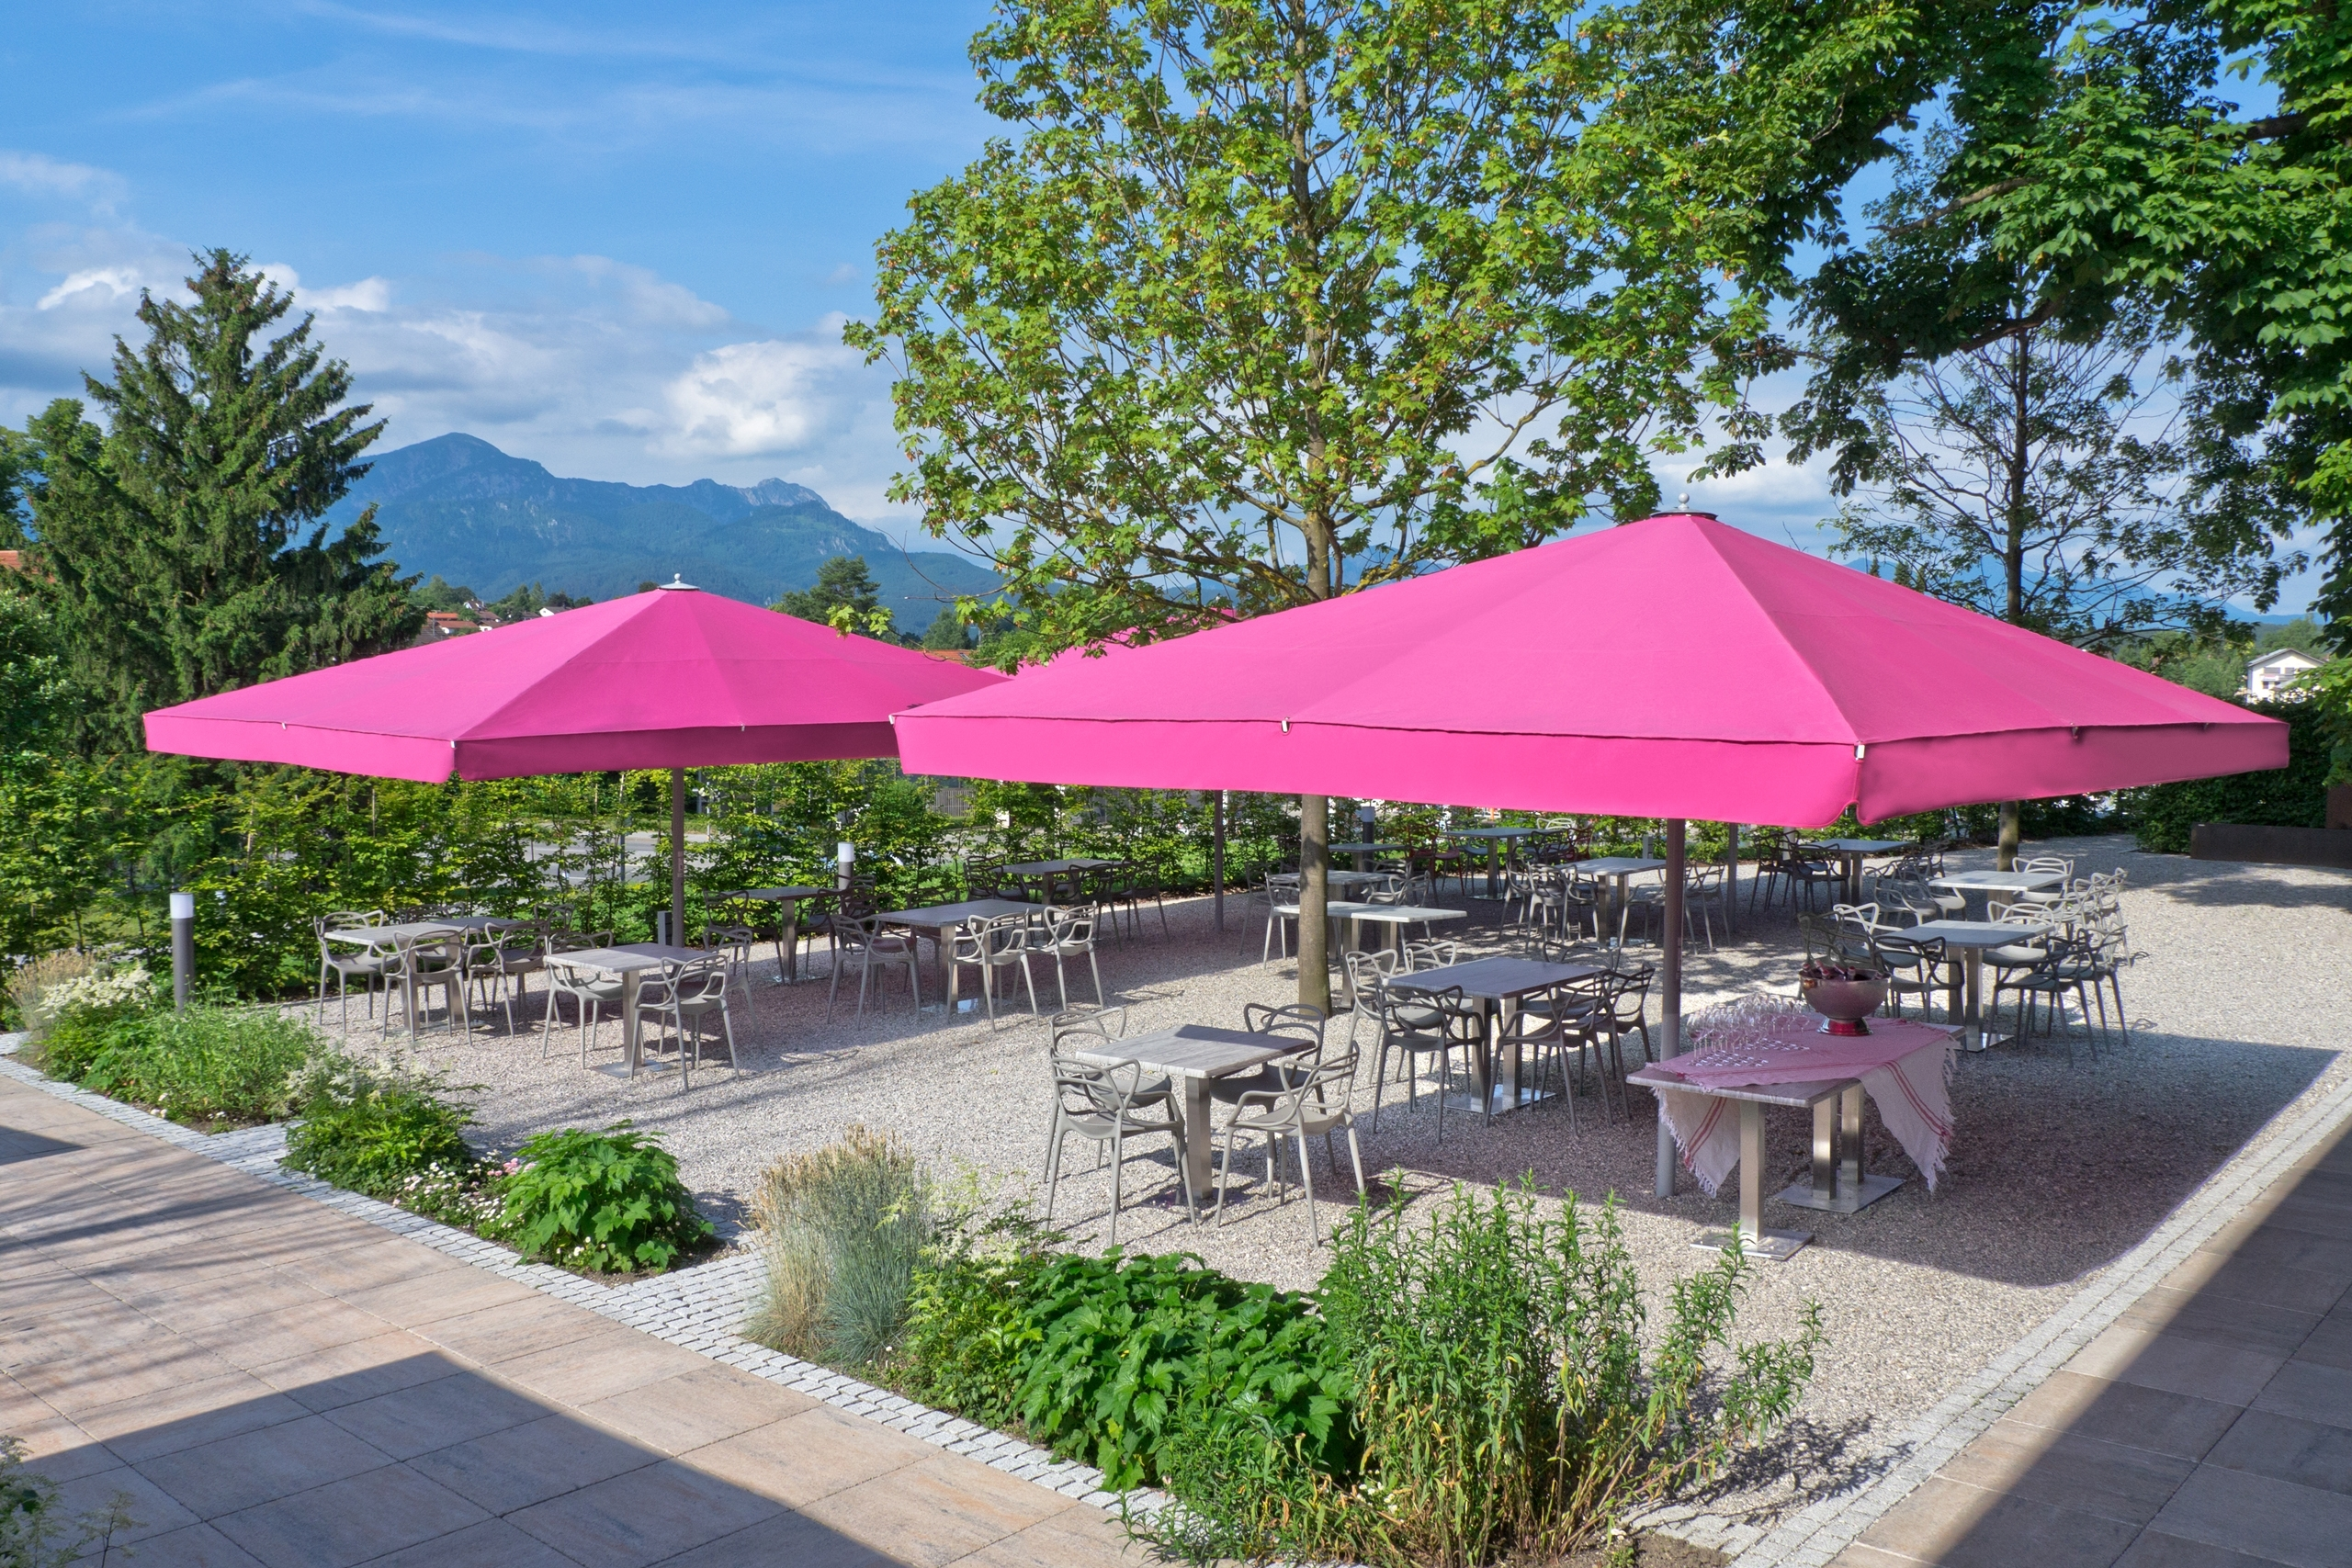 Photo Gallery Of Giant Patio Umbrellas With Regard To 2018 Extra Large Patio Umbrellas (View 18 of 20)